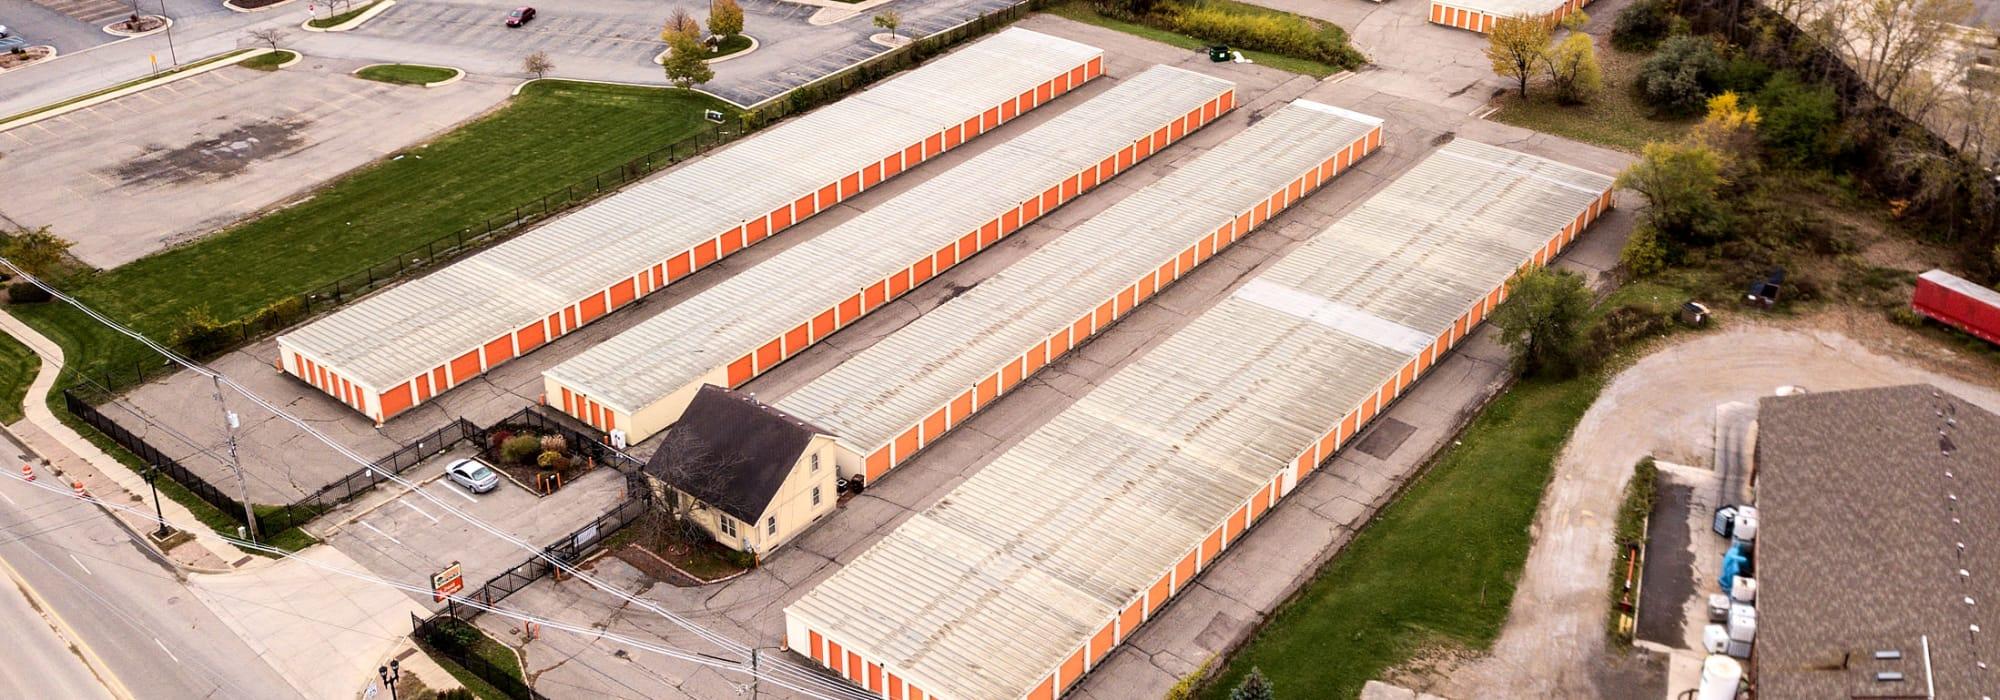 Prime Storage in Lansing, MI